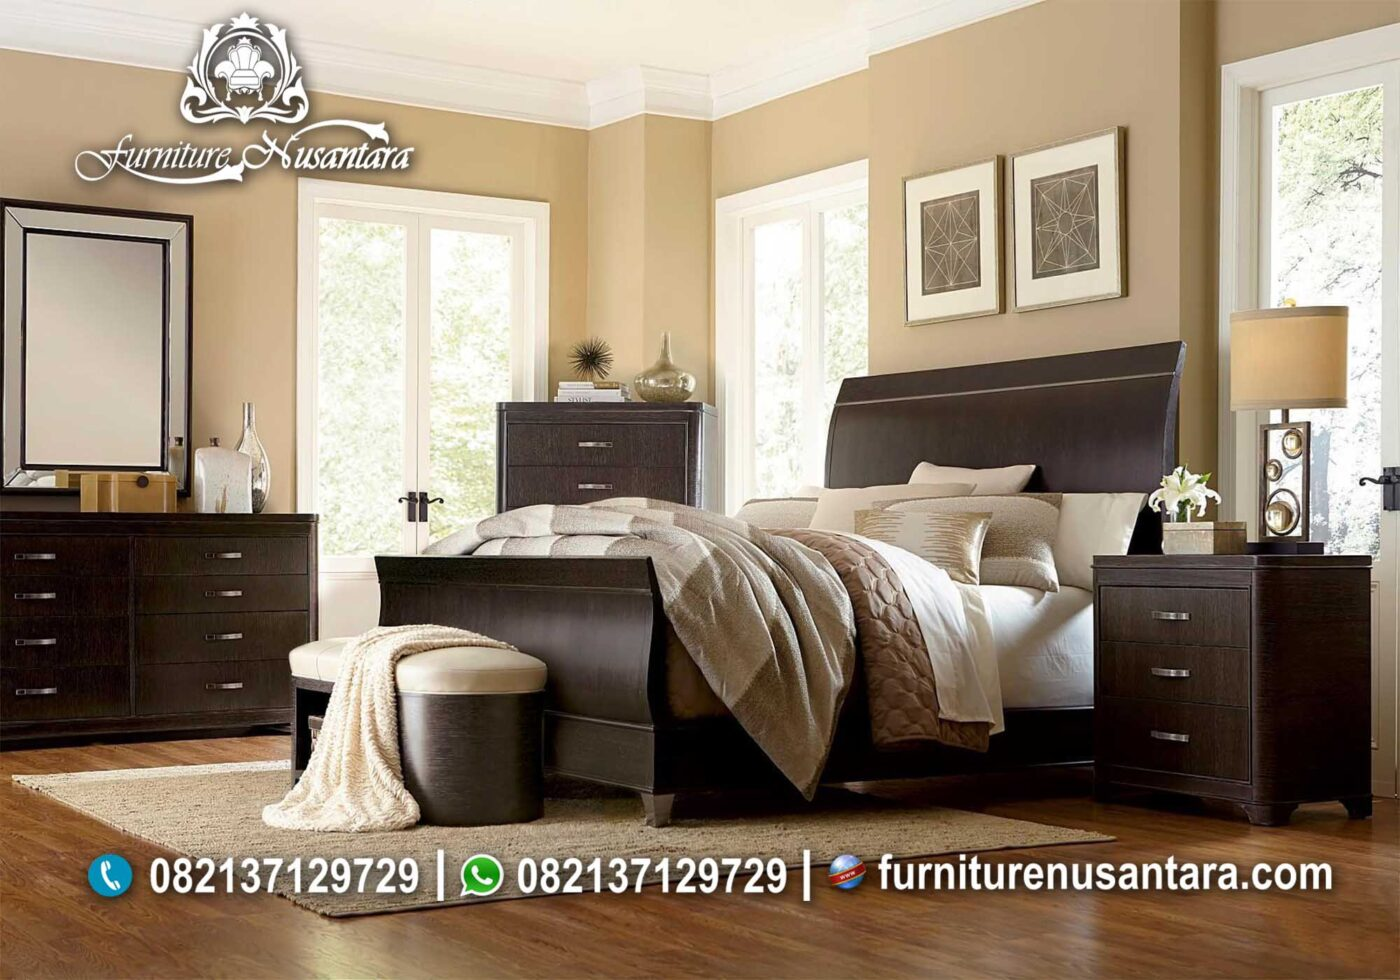 Kamar Minimalis Warna Salak KS-36, Furniture Nusantara